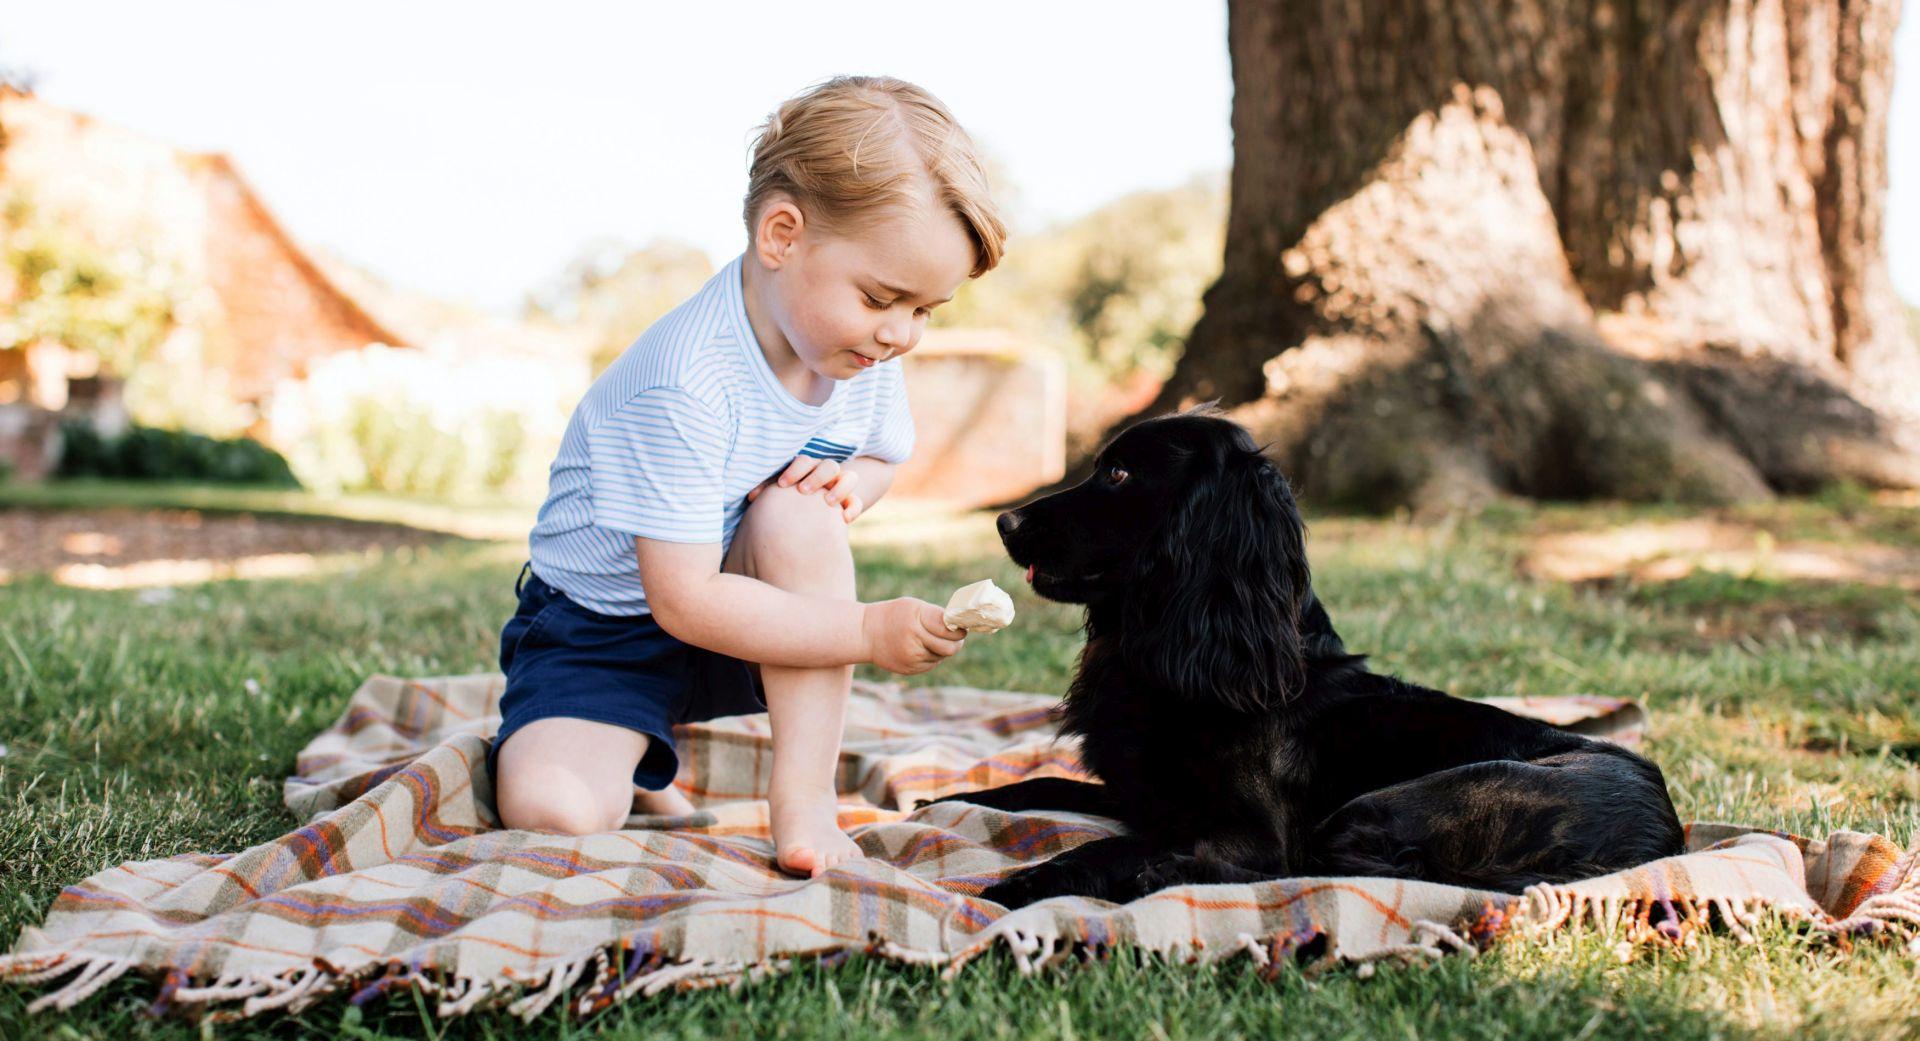 FOTO: GEORGE SLAVI TREĆI ROĐENDAN Kraljevska obitelj objavila nove fotografije malog princa